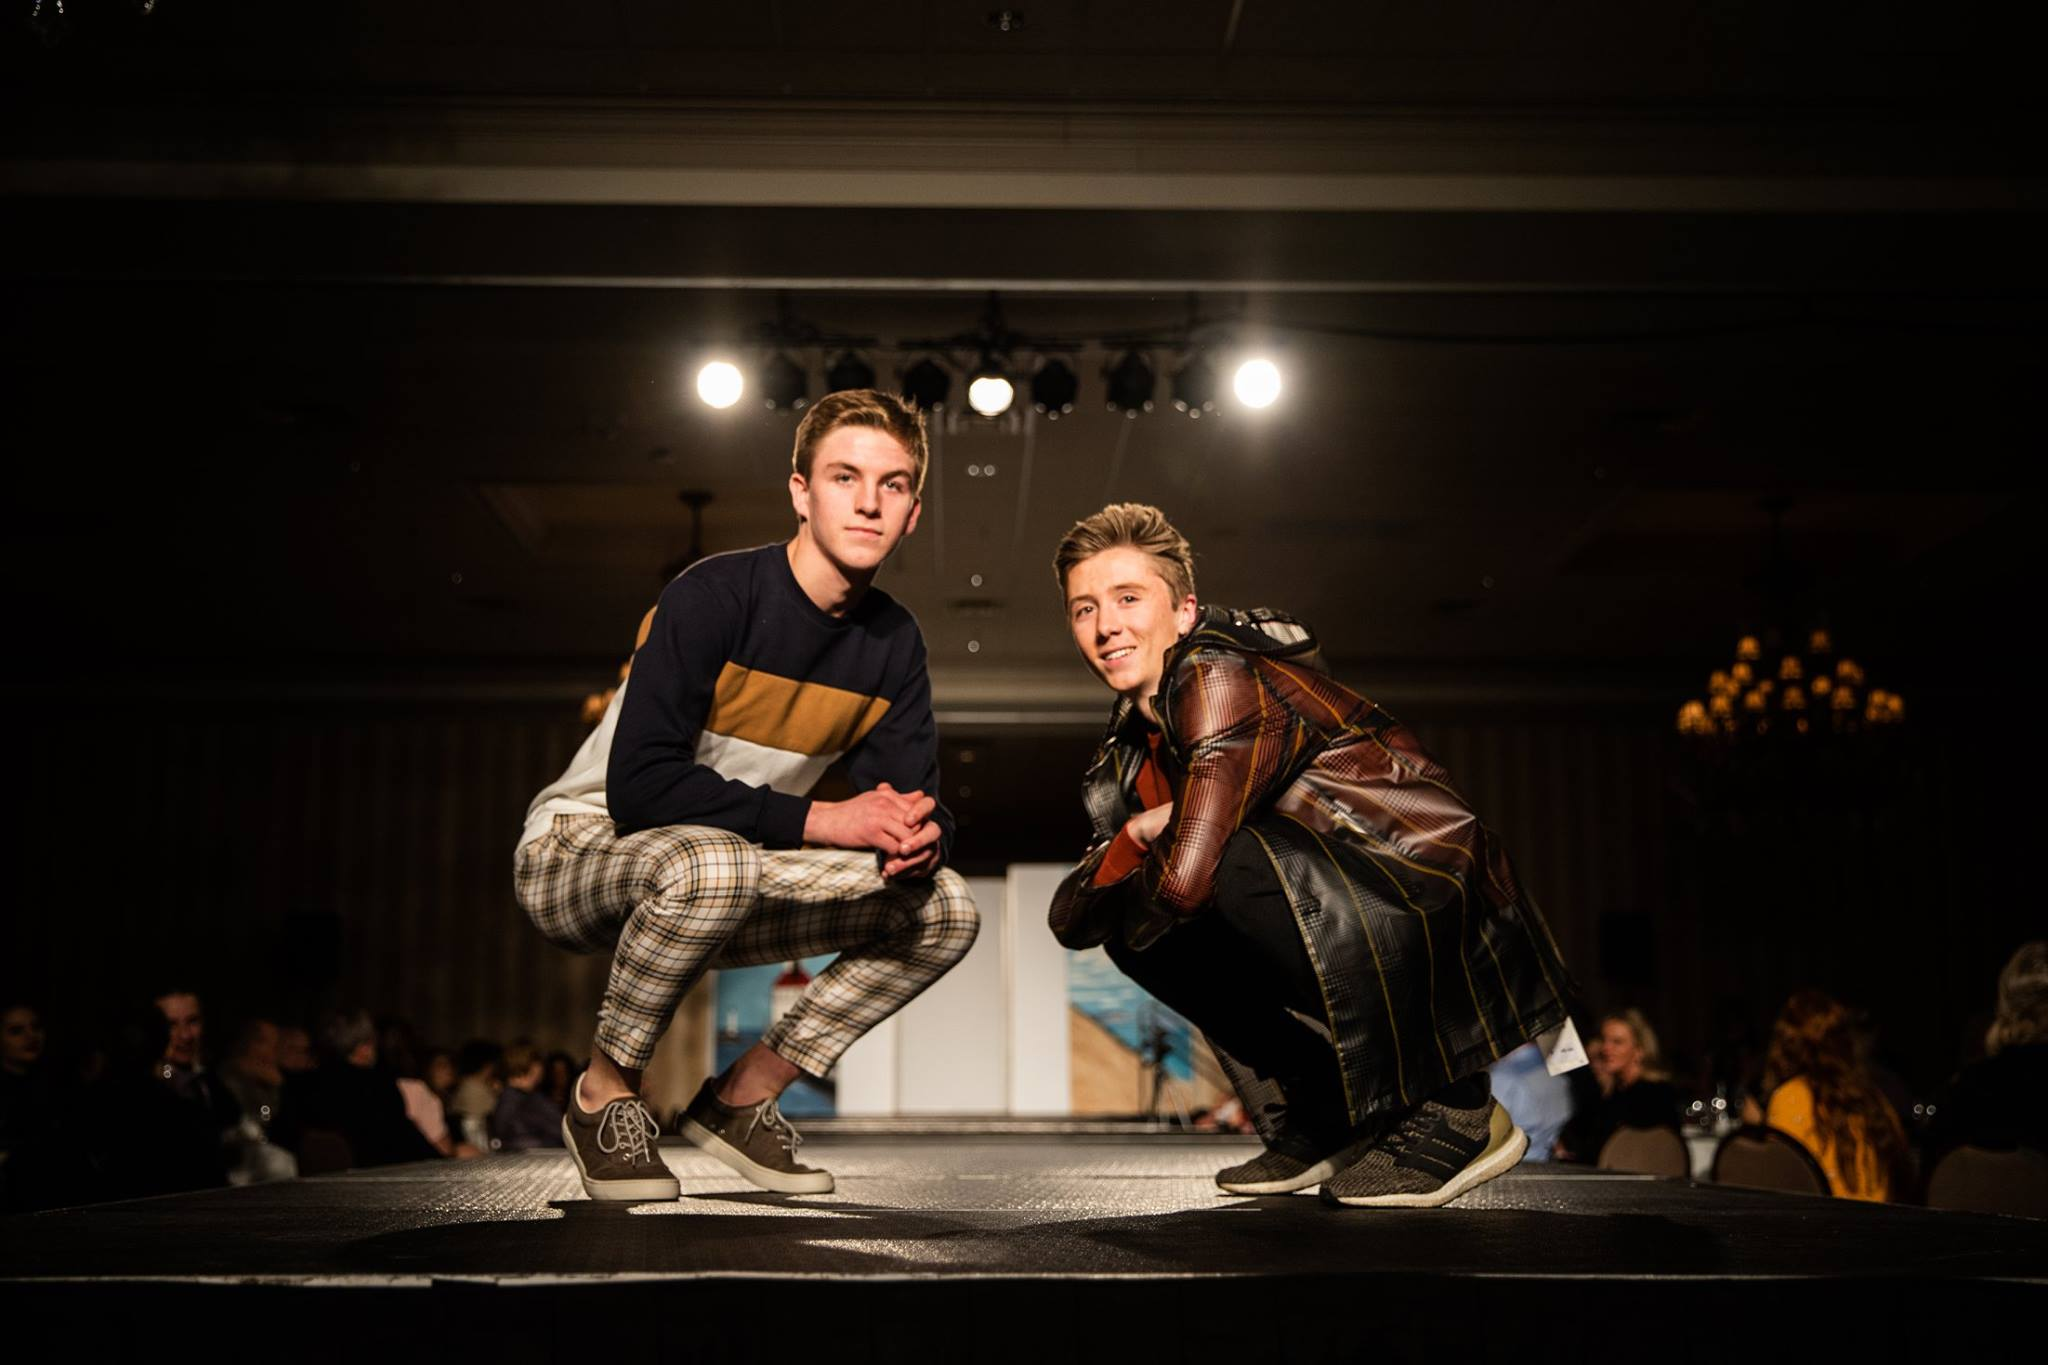 Lutheran_North_High_School_Macomb_Michigan_LHN_Fashion_Show_2019 (30).jpg